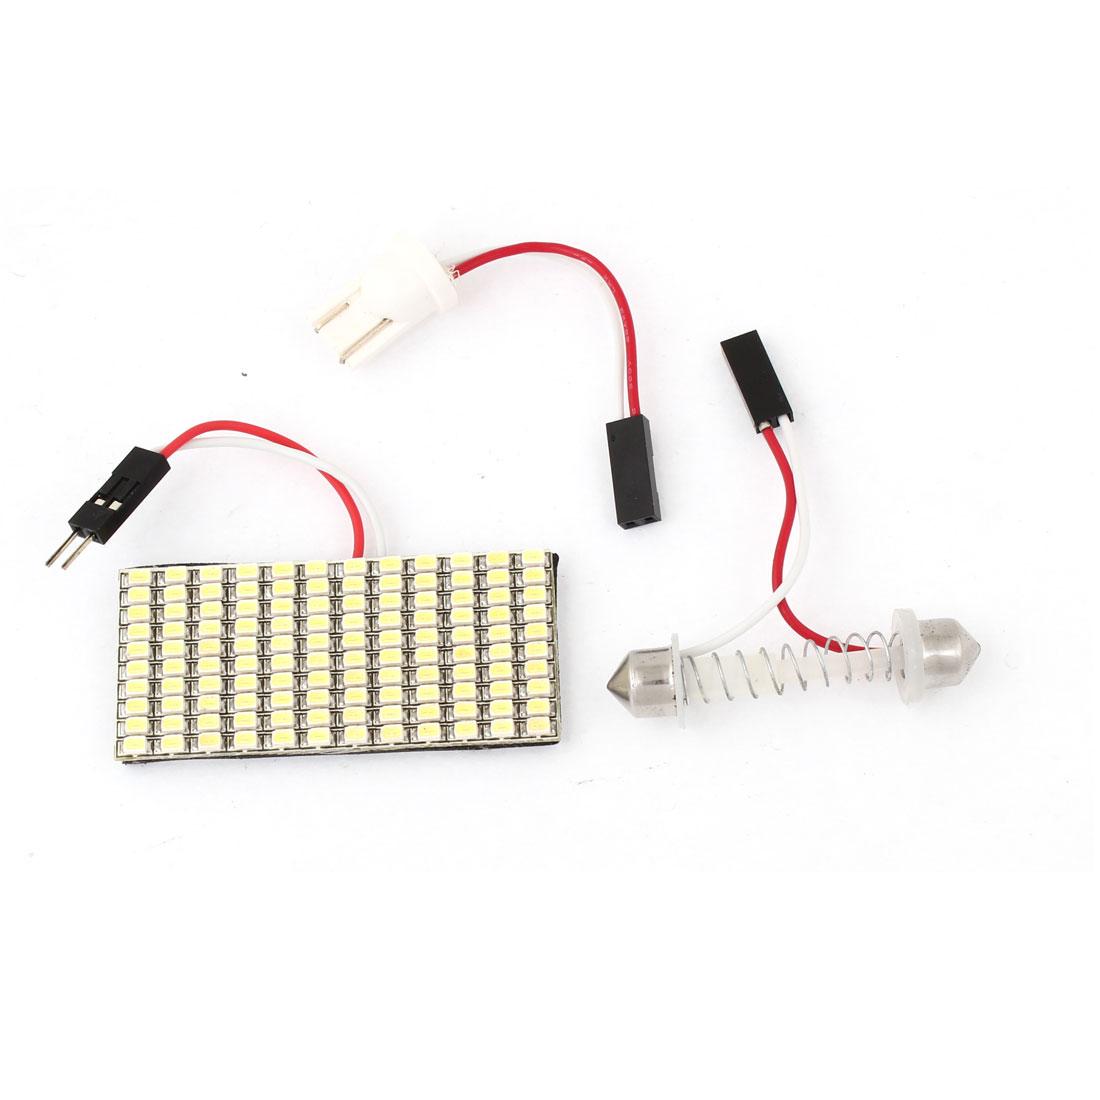 White 120 LED 1206 SMD Dome Light Lamp Bulb w T10 Festoon Adapter for Car